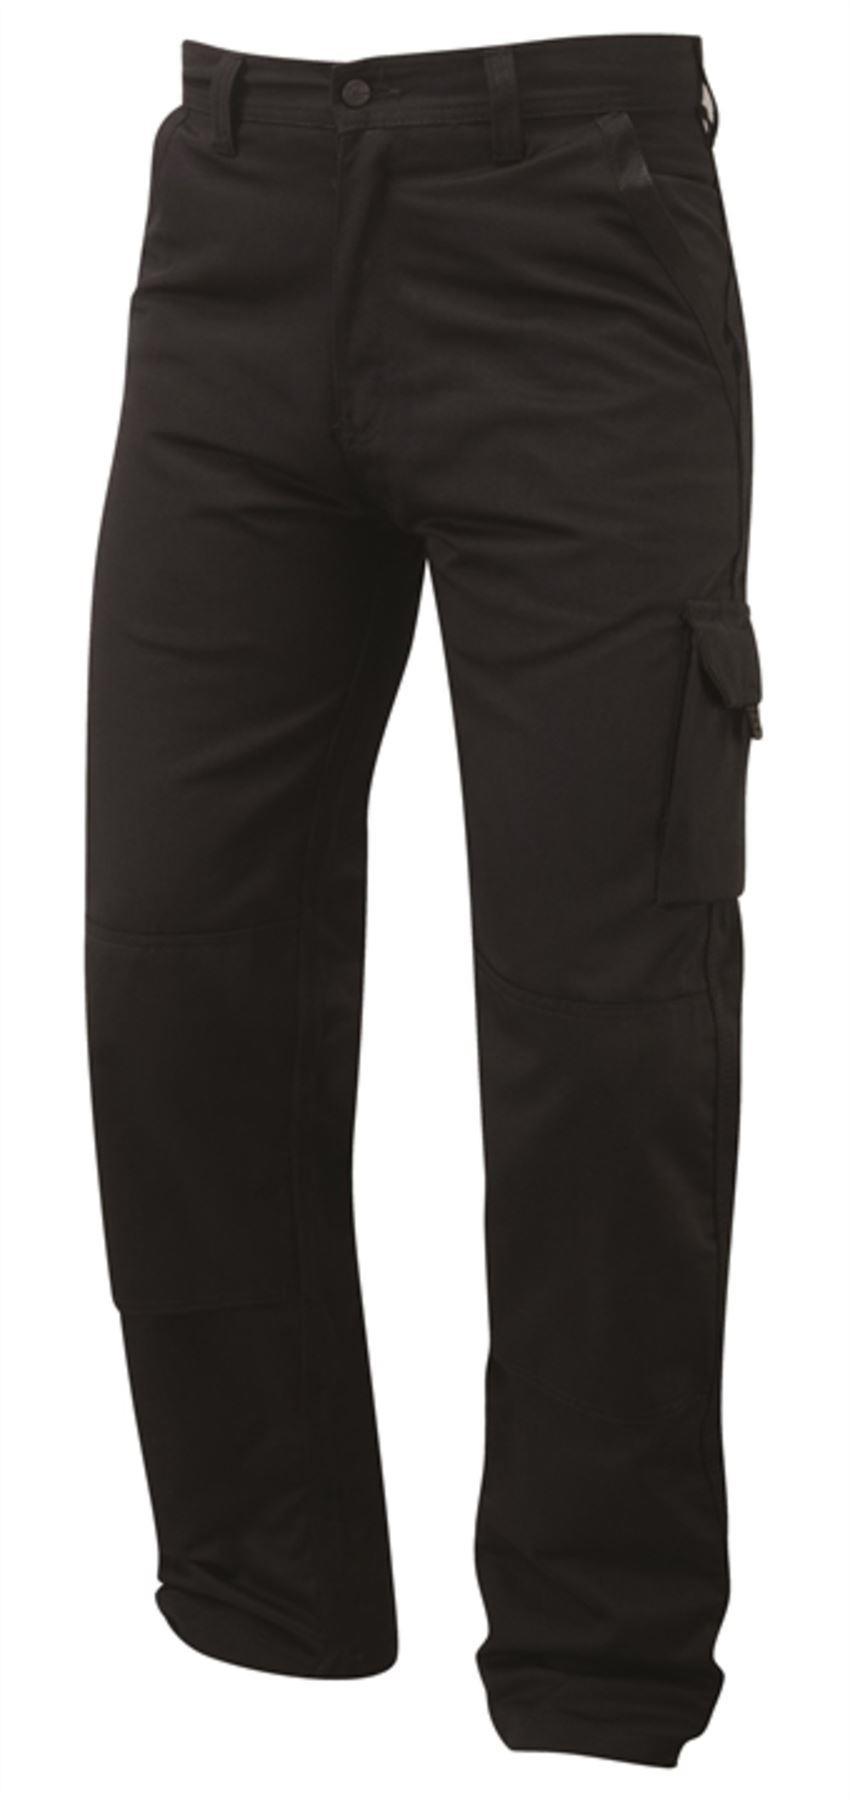 Orn Heron Kneepad Combat Trousers - Black|48W32L